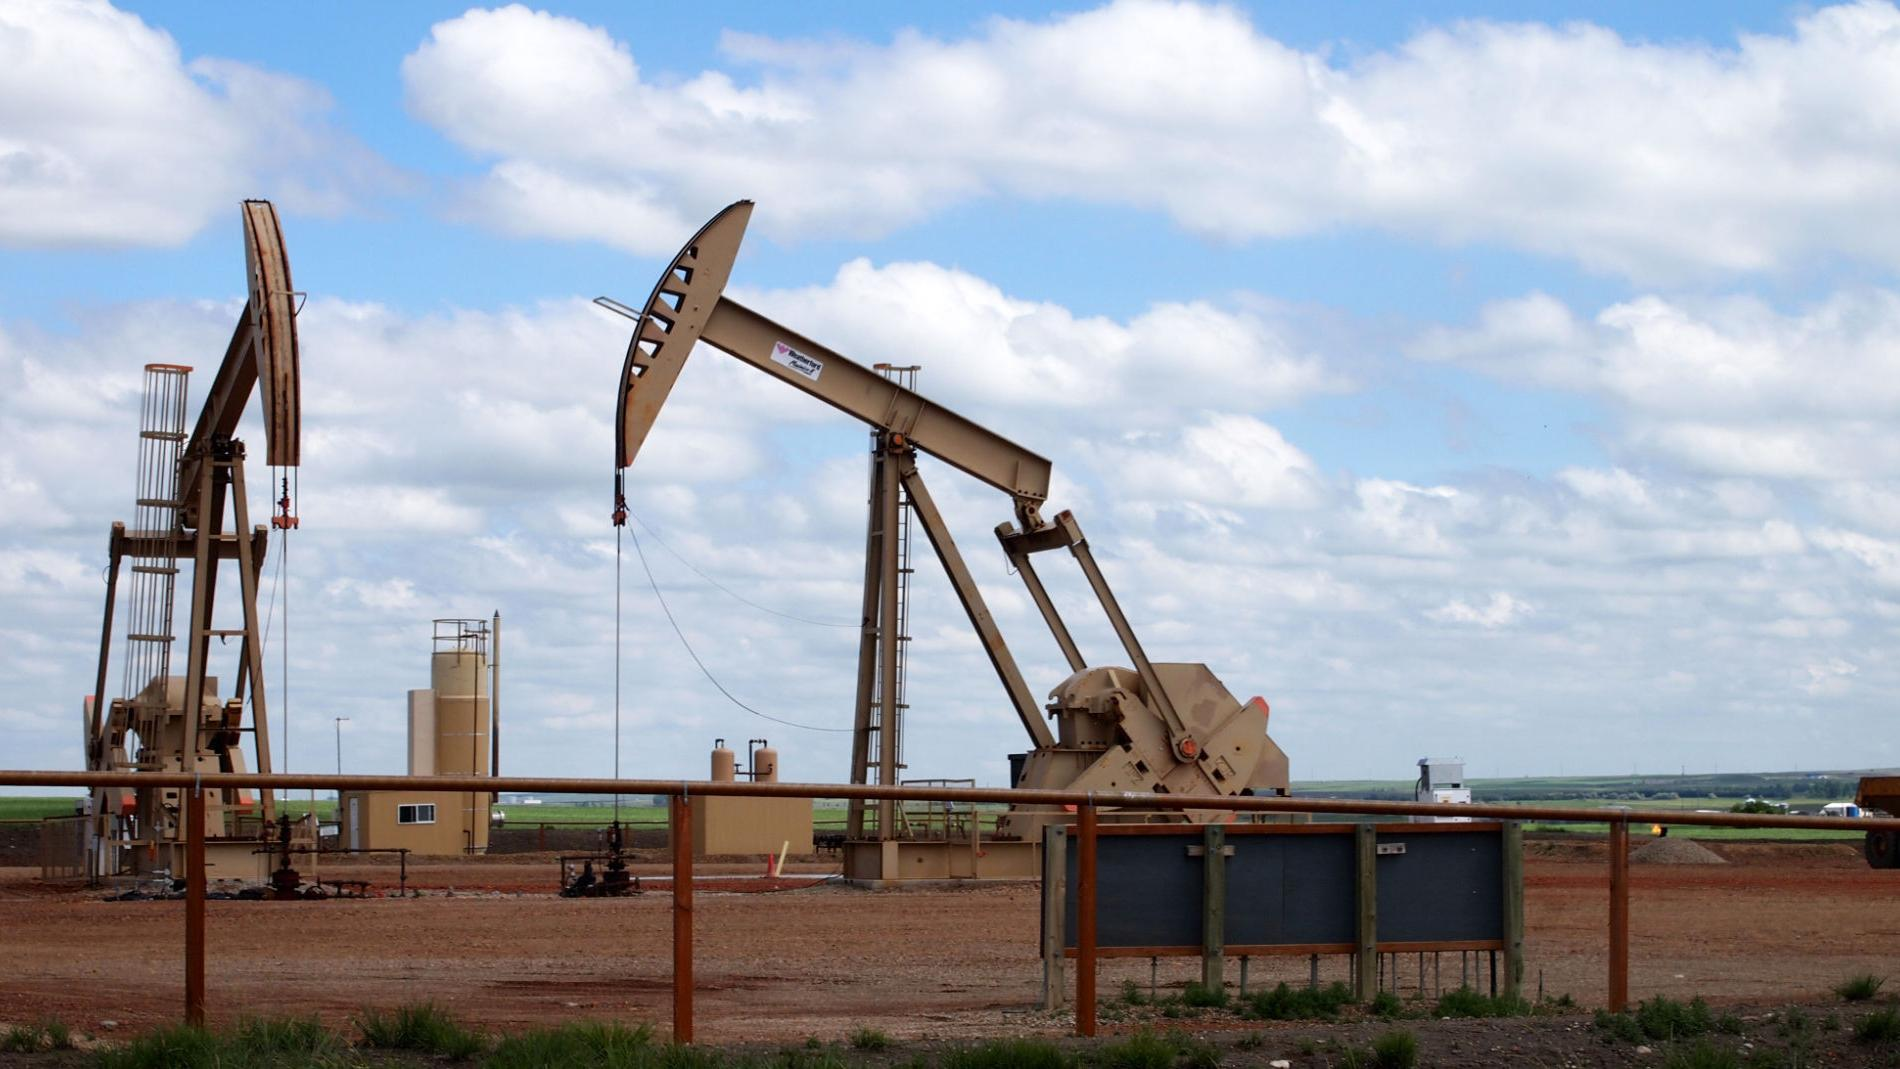 North Dakota oil production has largest drop ever in April | Bakken News | bismarcktribune.com